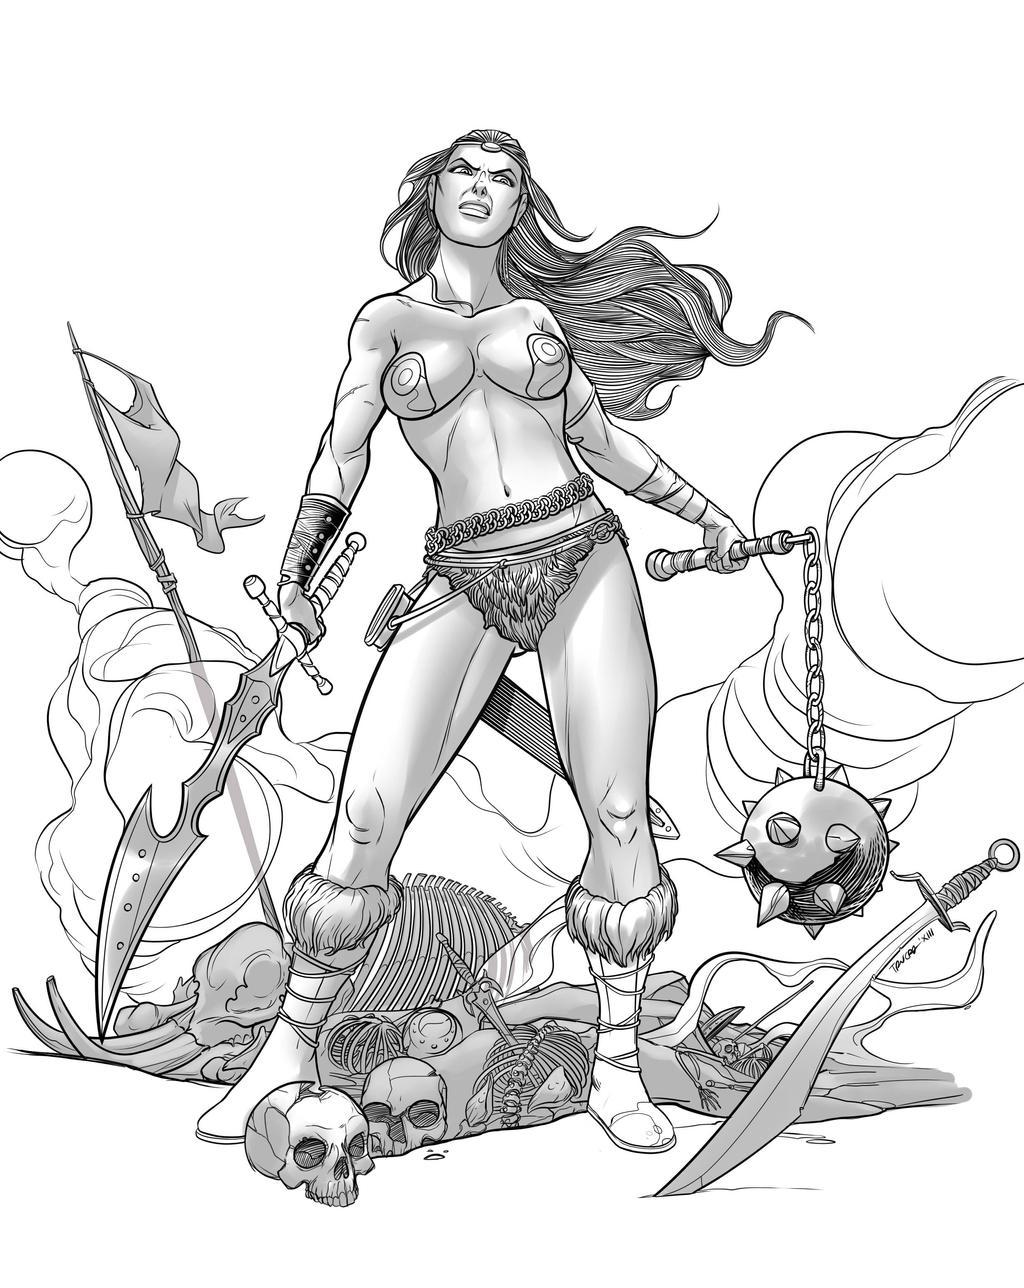 Porn drawings girl warriors hentia scenes